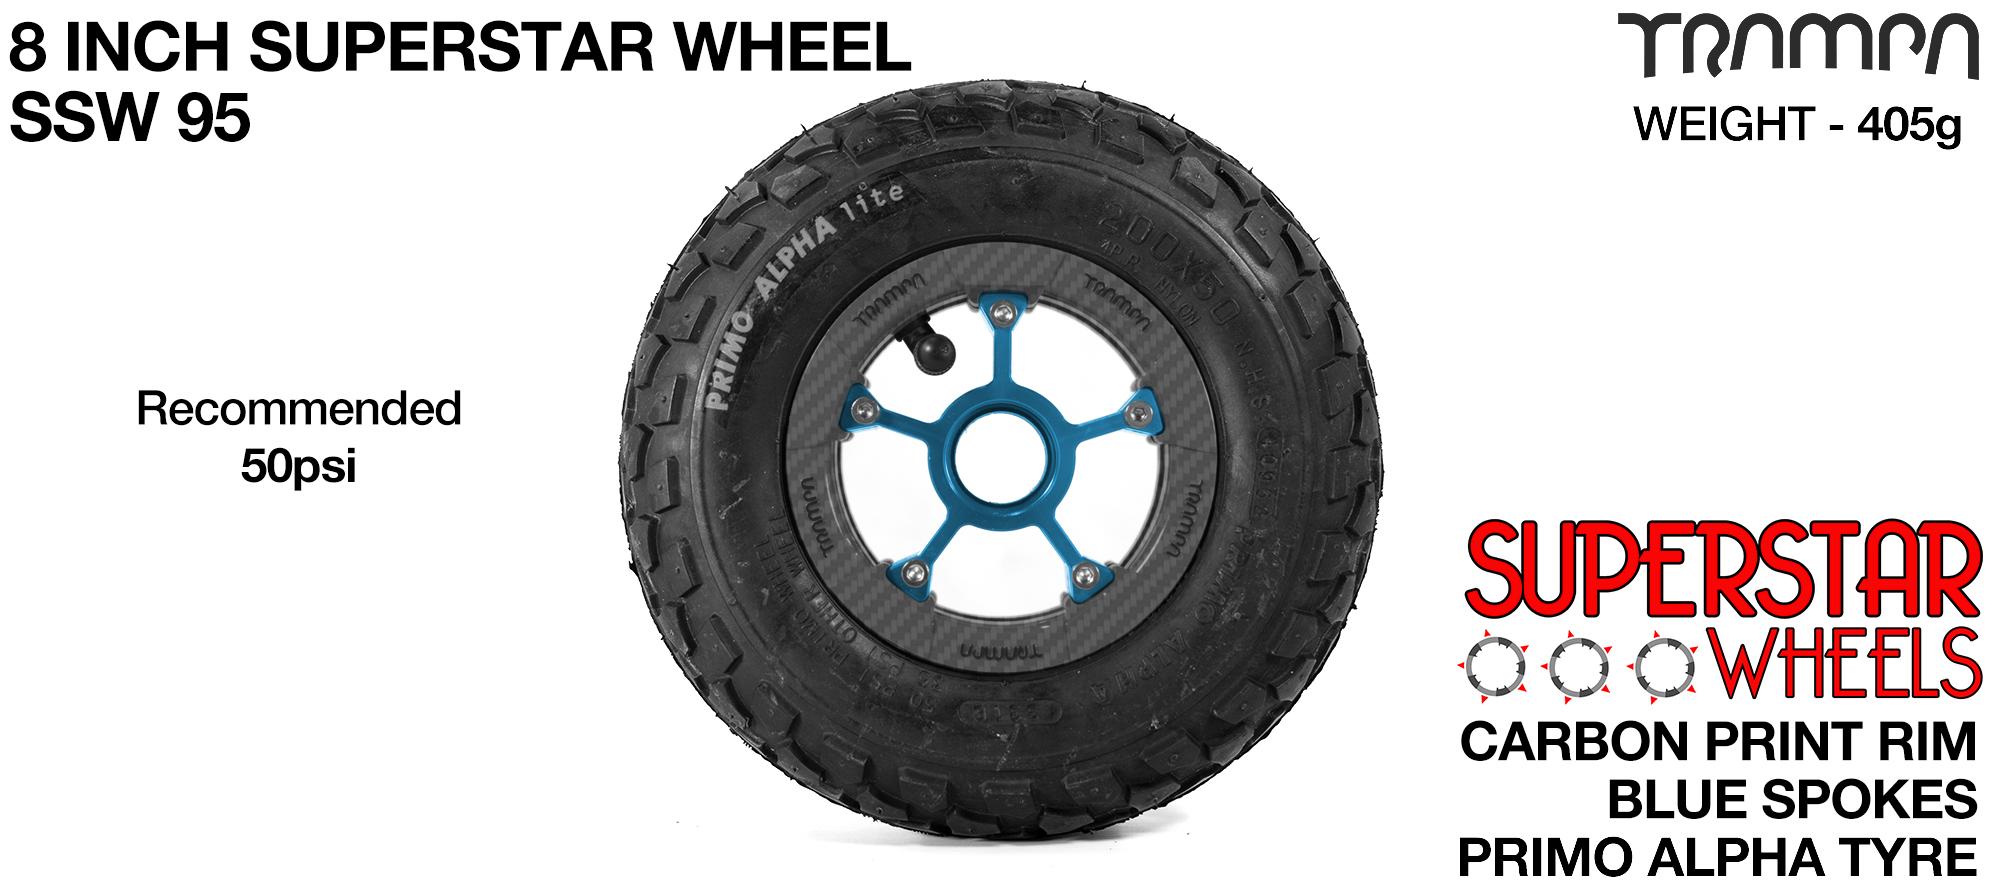 Superstar 8 inch wheel - Carbon Fiber Print rim with Blue Anodised Spokes & Black Alpha 8 Inch Tyre